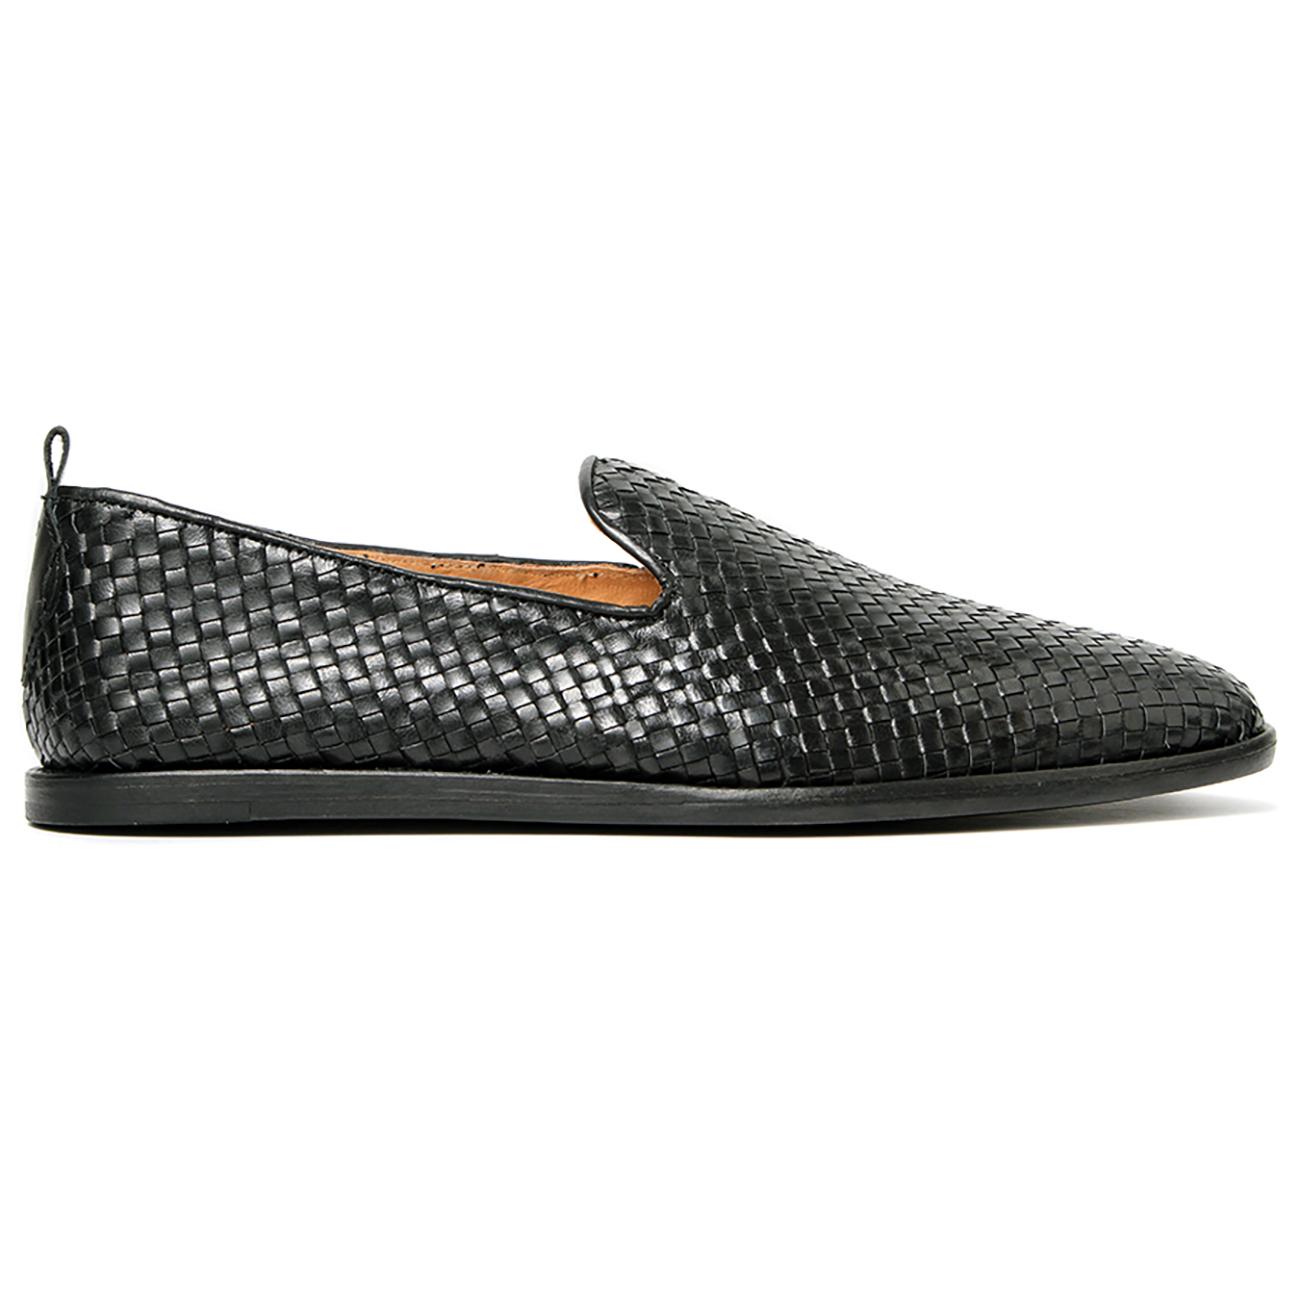 Mens H By Hudson Ipanema 2 Weave Fashion Leather Smart Holiday Work Shoe UK 7-12